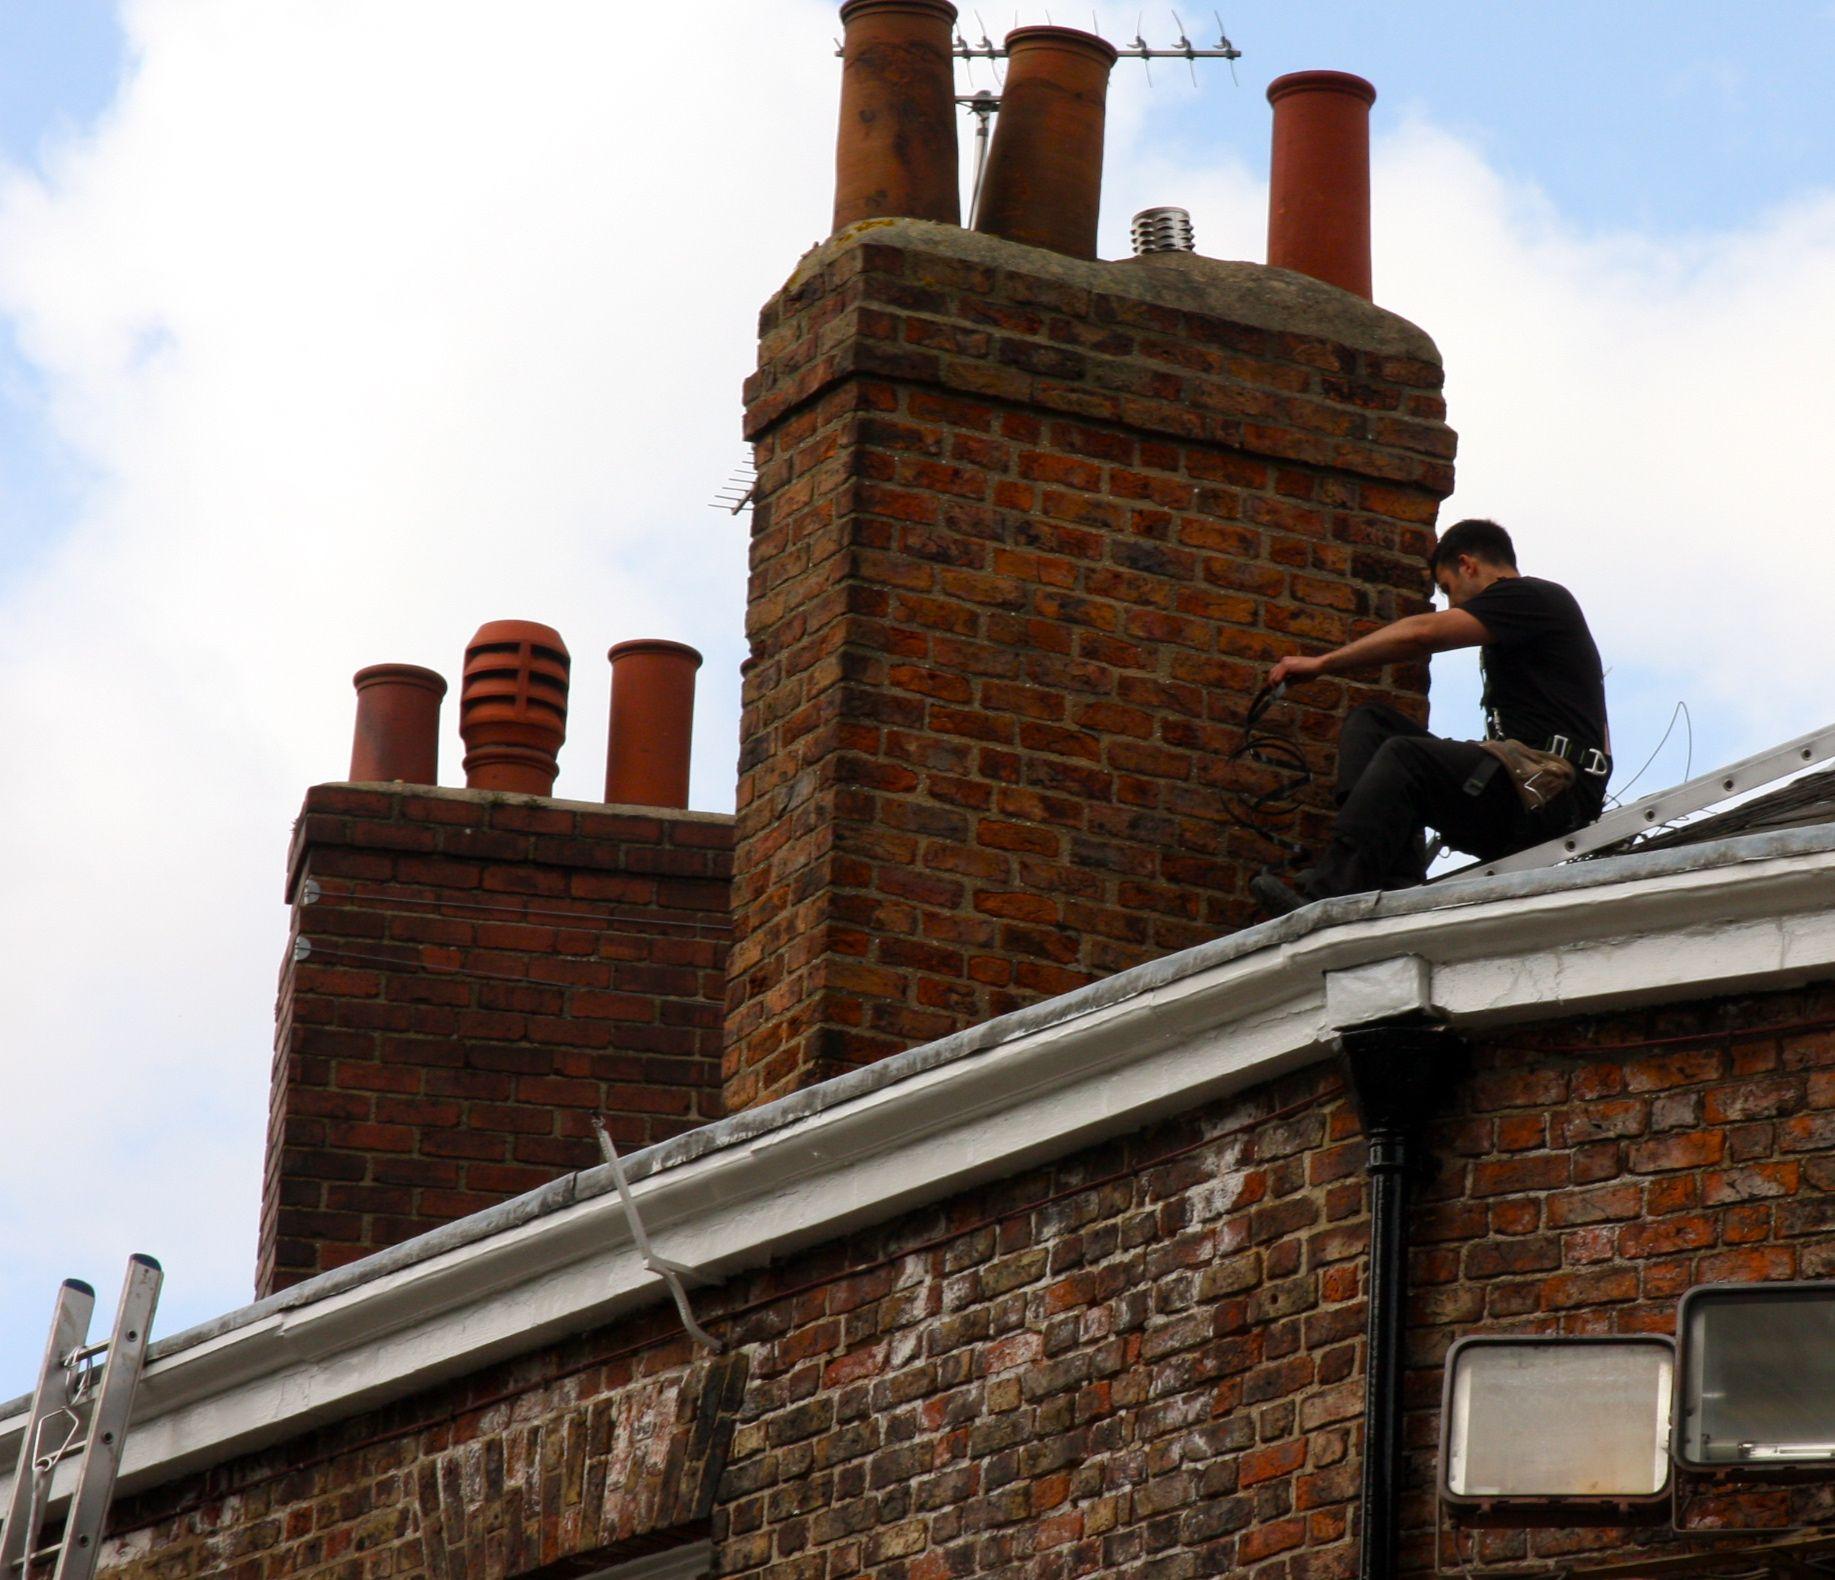 Old Chimney Stacks Chimney Sweep Gargoyles Rooftop